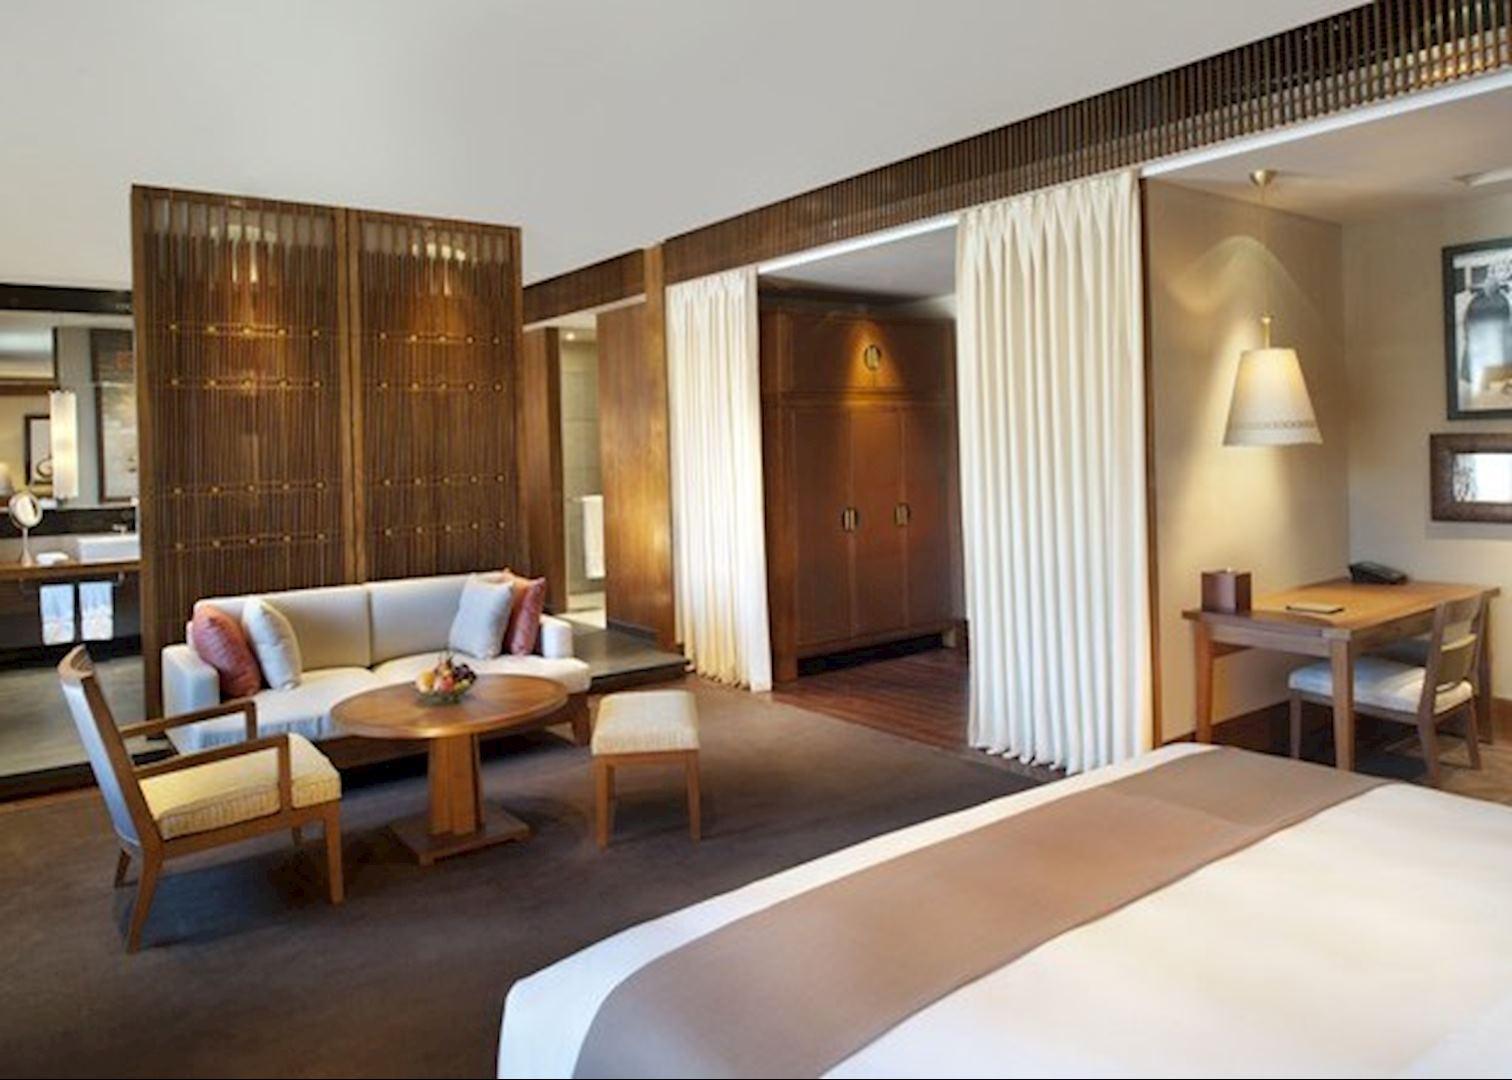 St regis lhasa resort hotels in lhasa audley travel for Affitti cabina cabina resort pinecrest